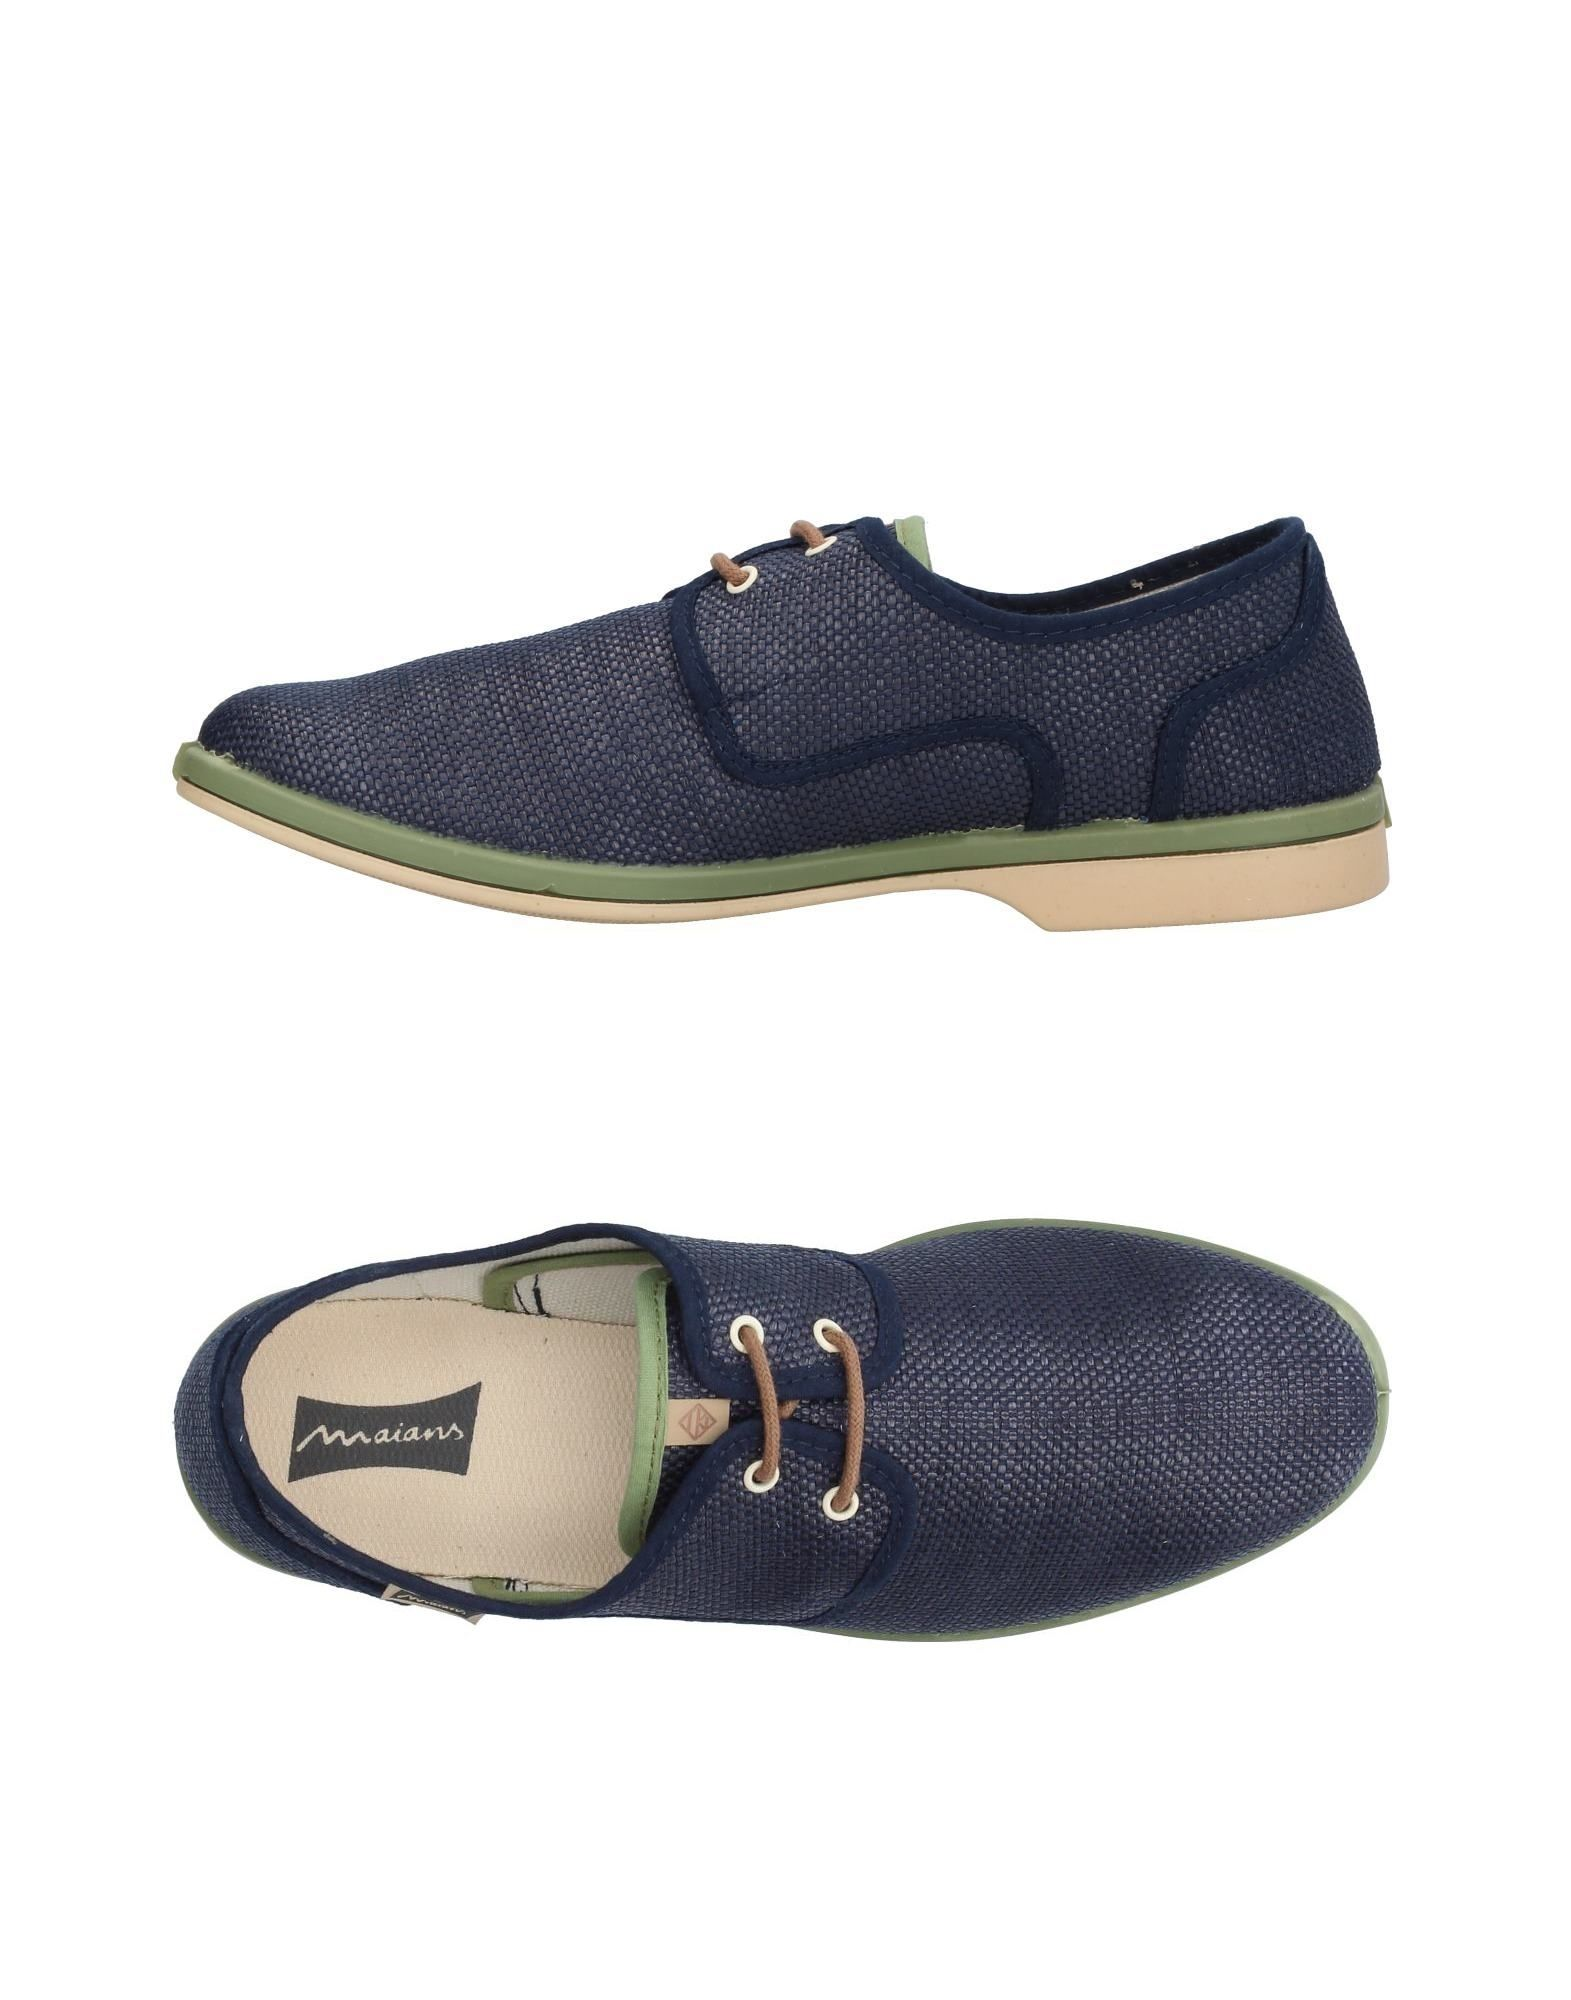 brooks низкие кеды и кроссовки MAIANS Низкие кеды и кроссовки